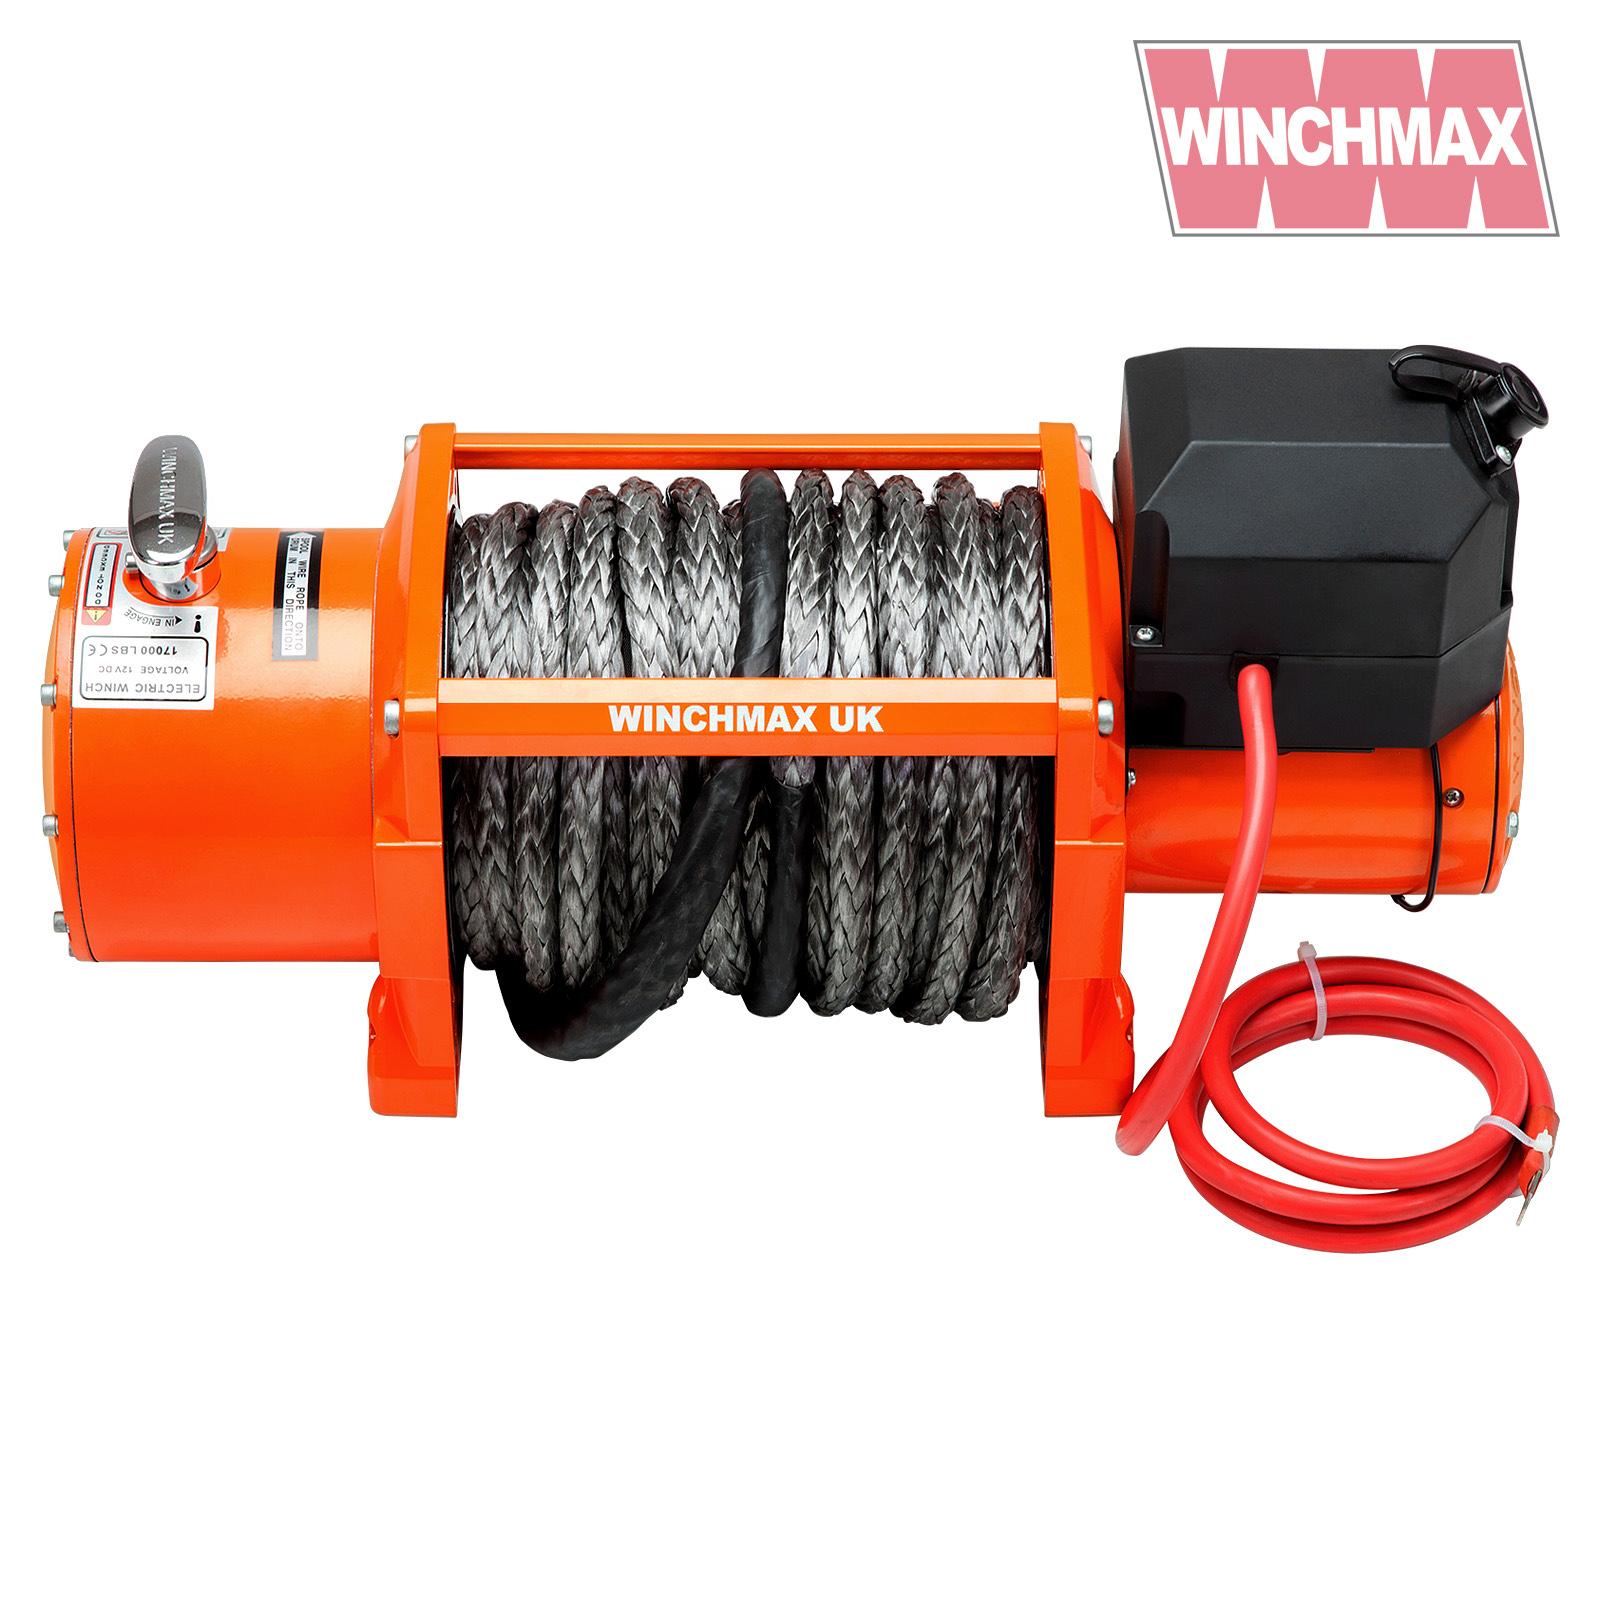 Wm1700012vrs winchmax 069 corrected